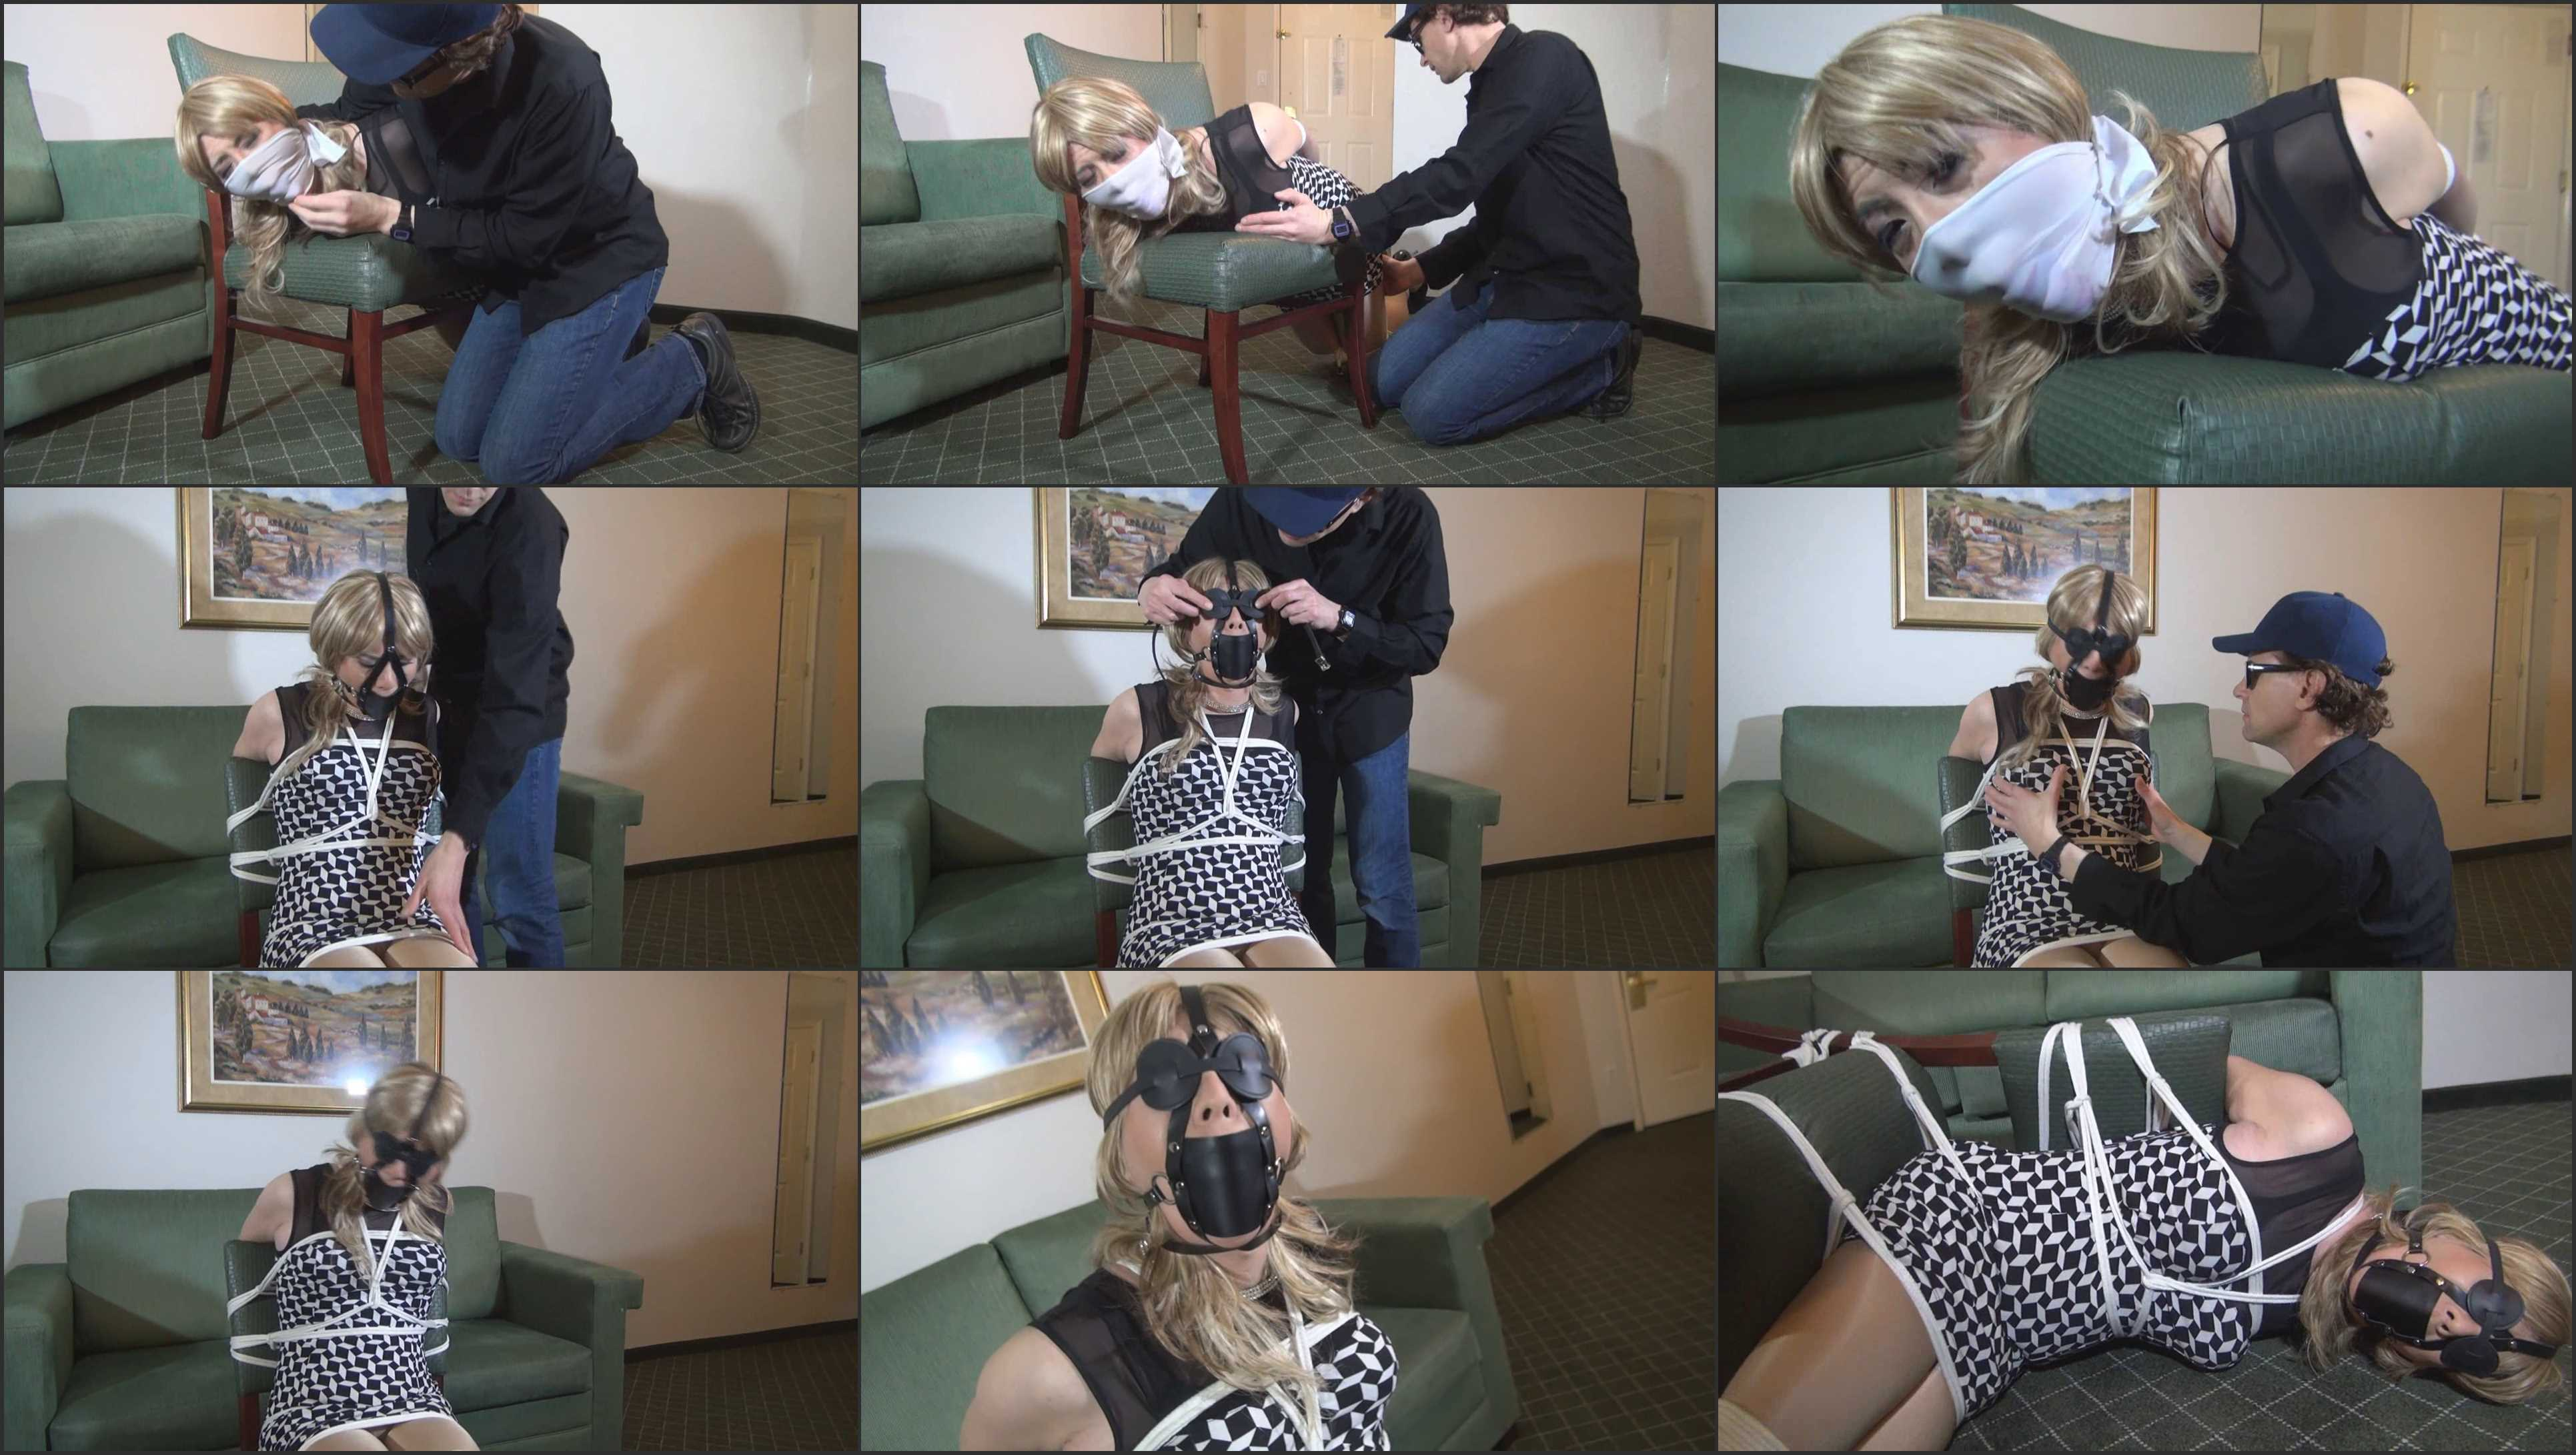 Vivian chen taped gagged 5